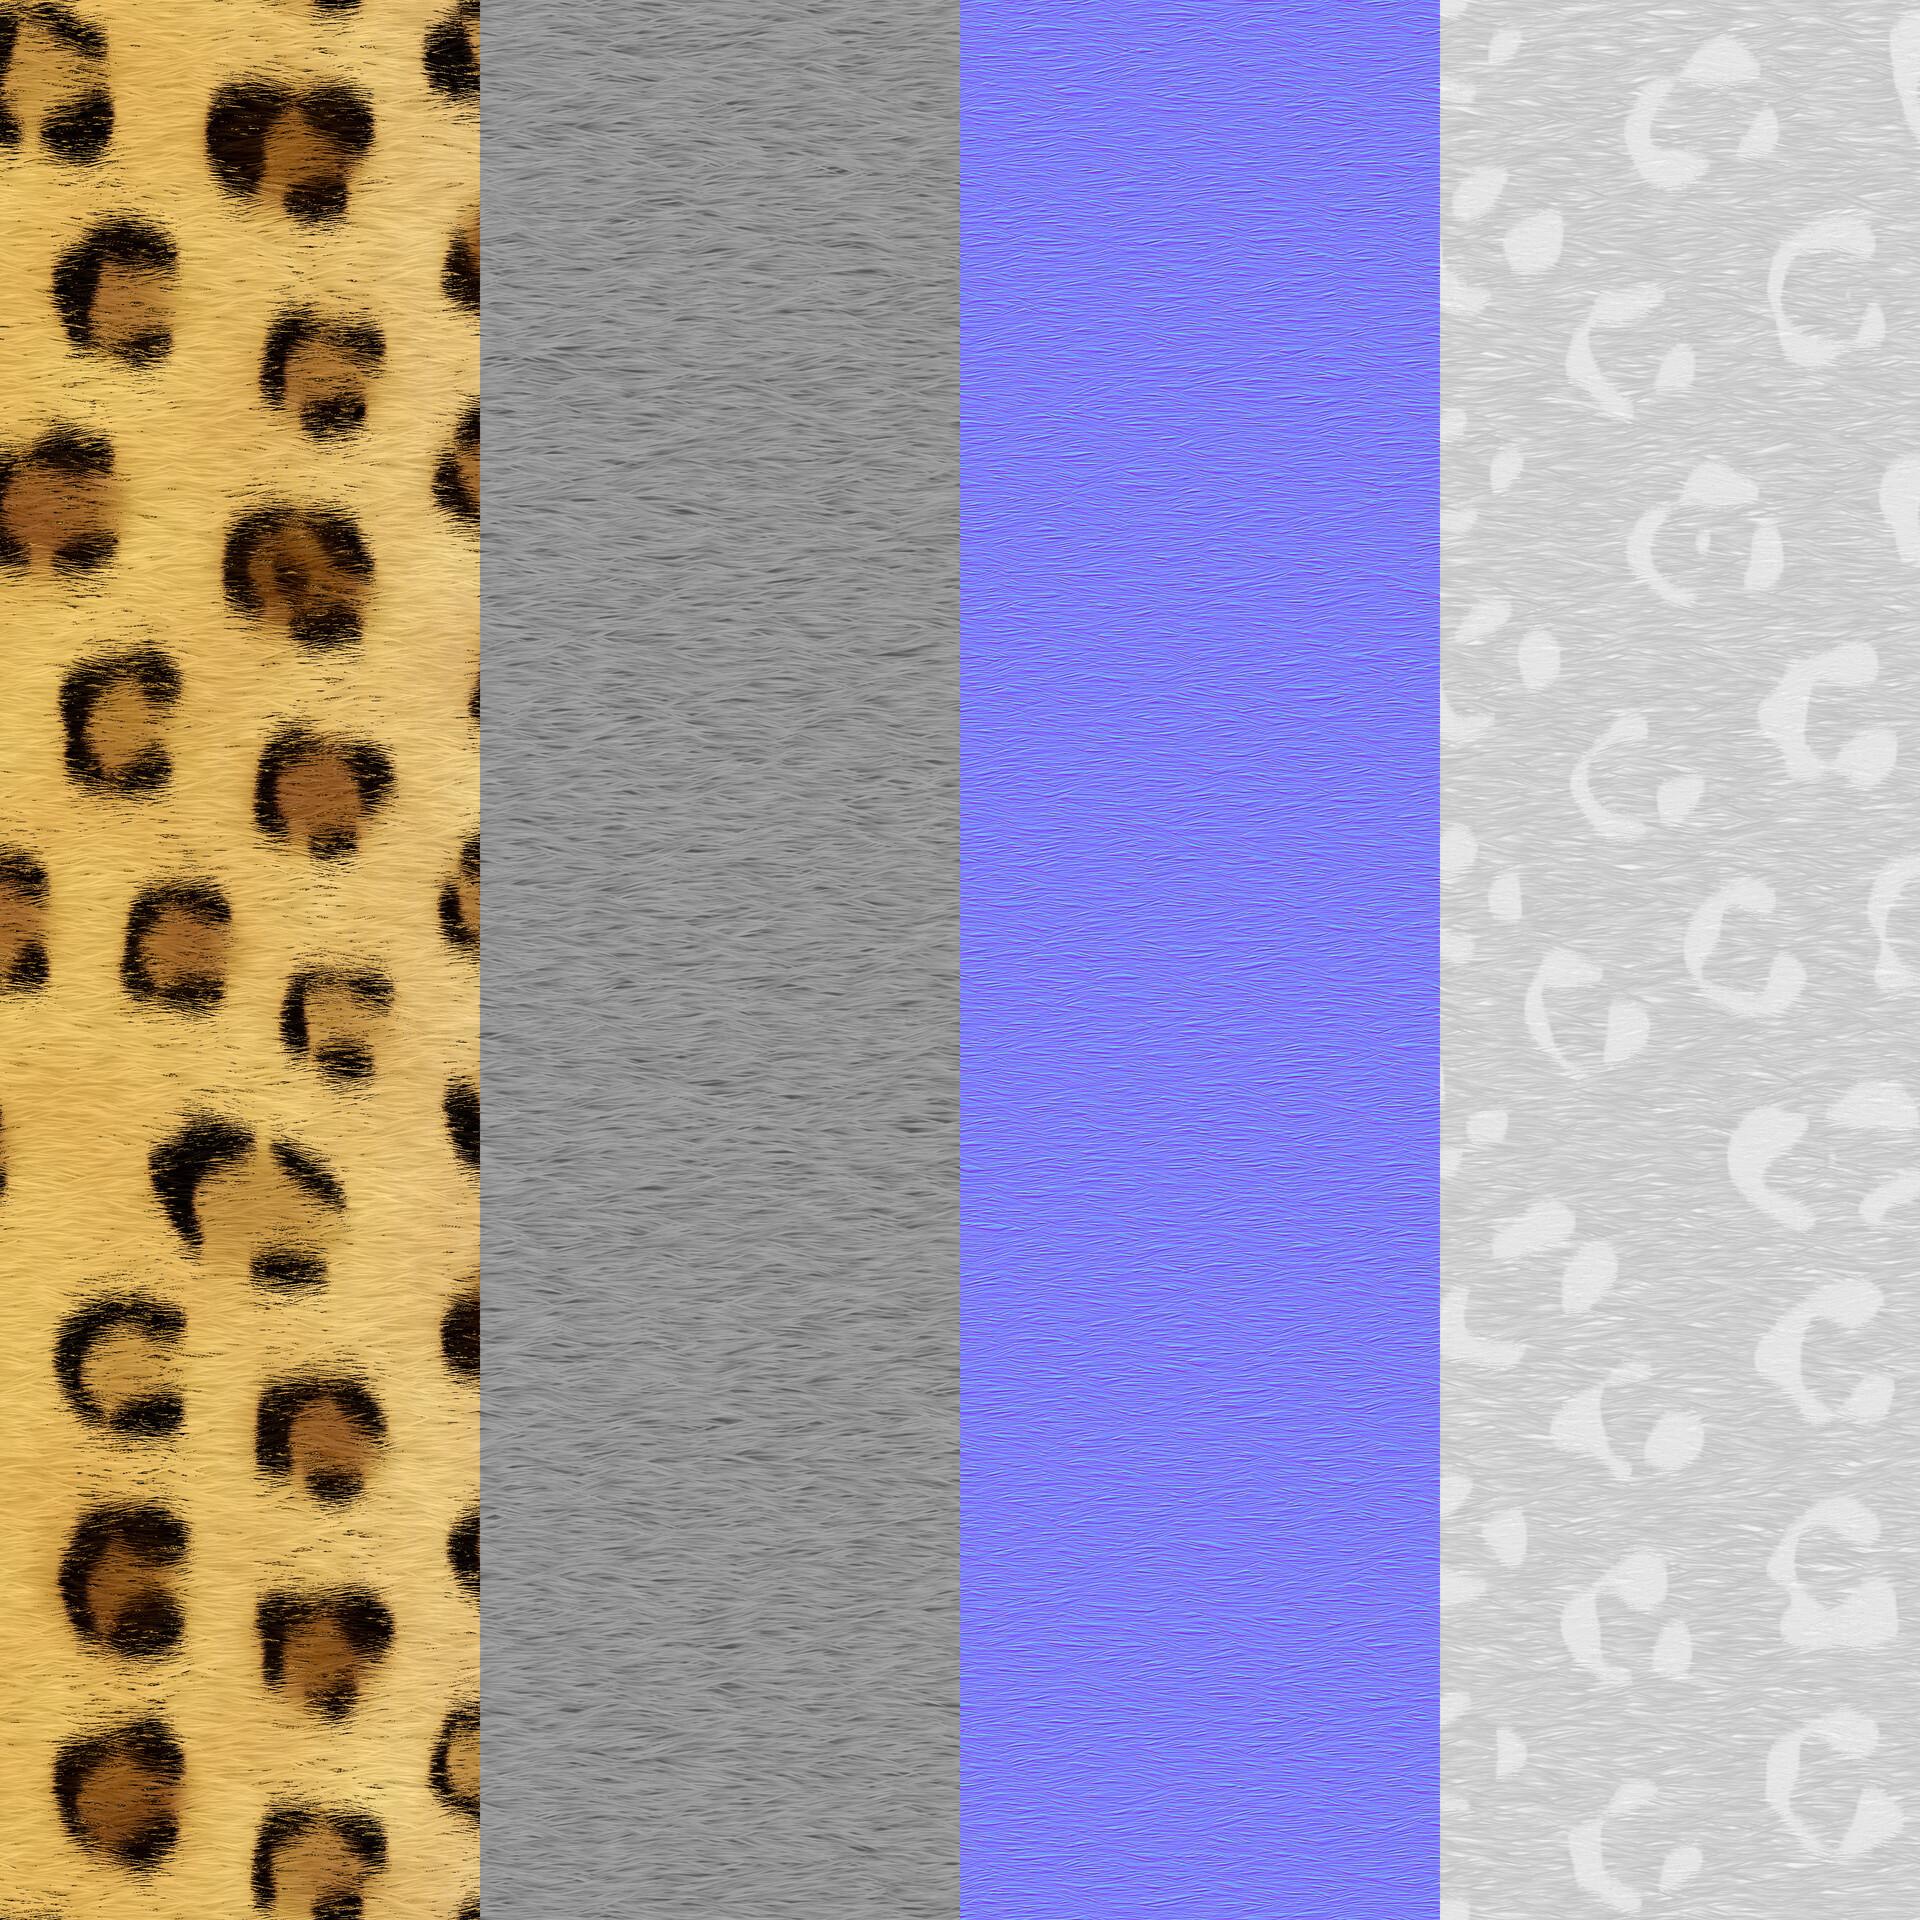 Leopard Maps